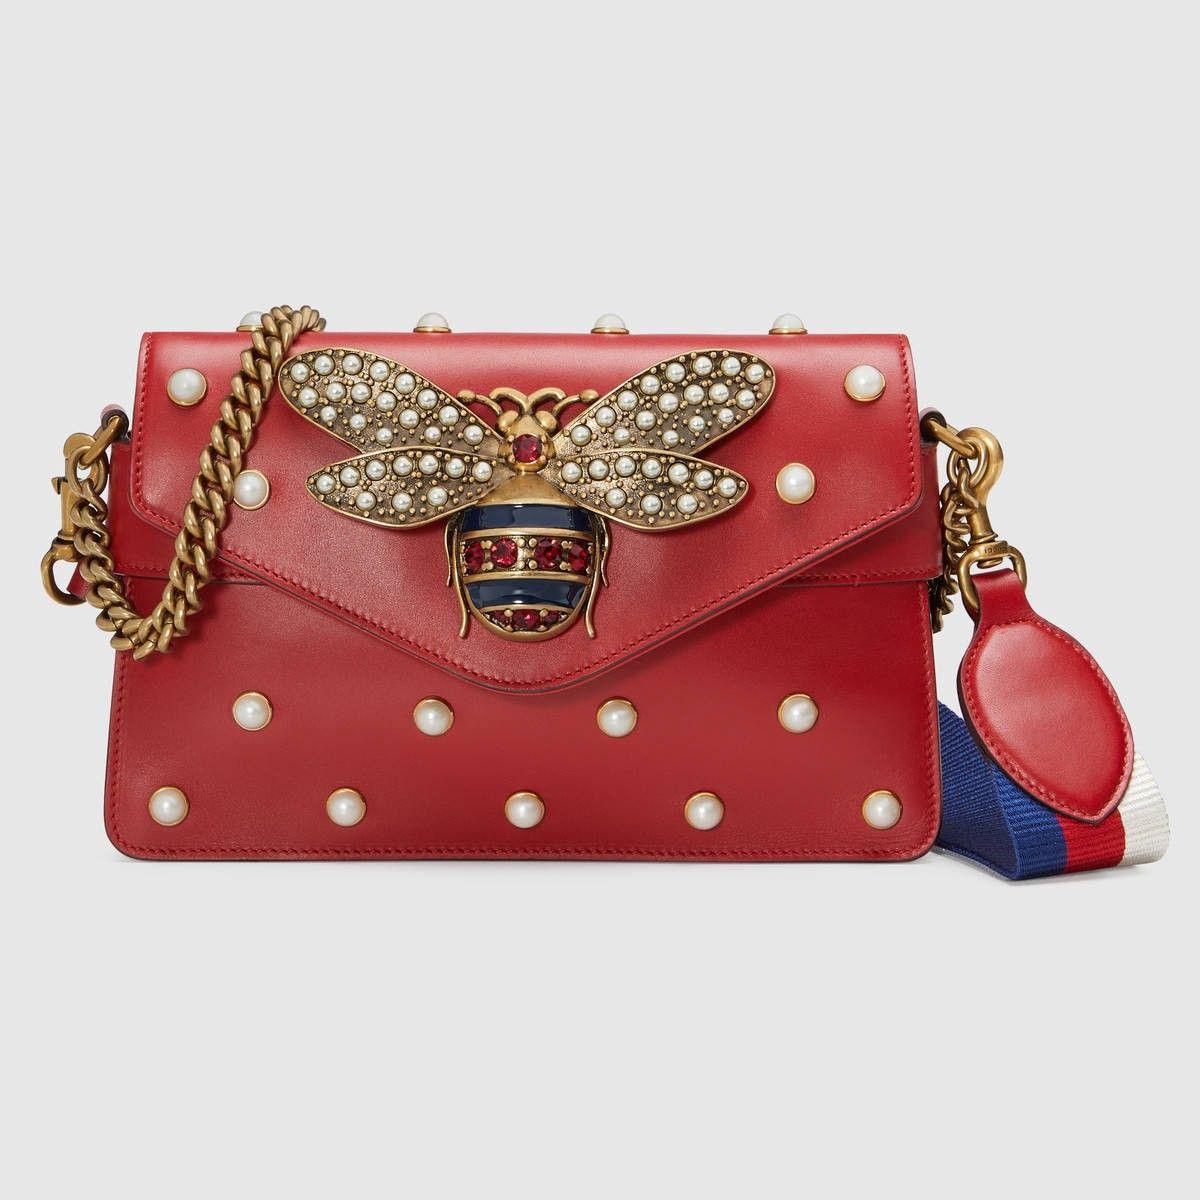 3d806135f6d0 GUCCI Broadway leather mini bag - hibiscus red leather. #gucci #bags #stone  #nylon #leather #lining #shoulder bags #crystal #silk #